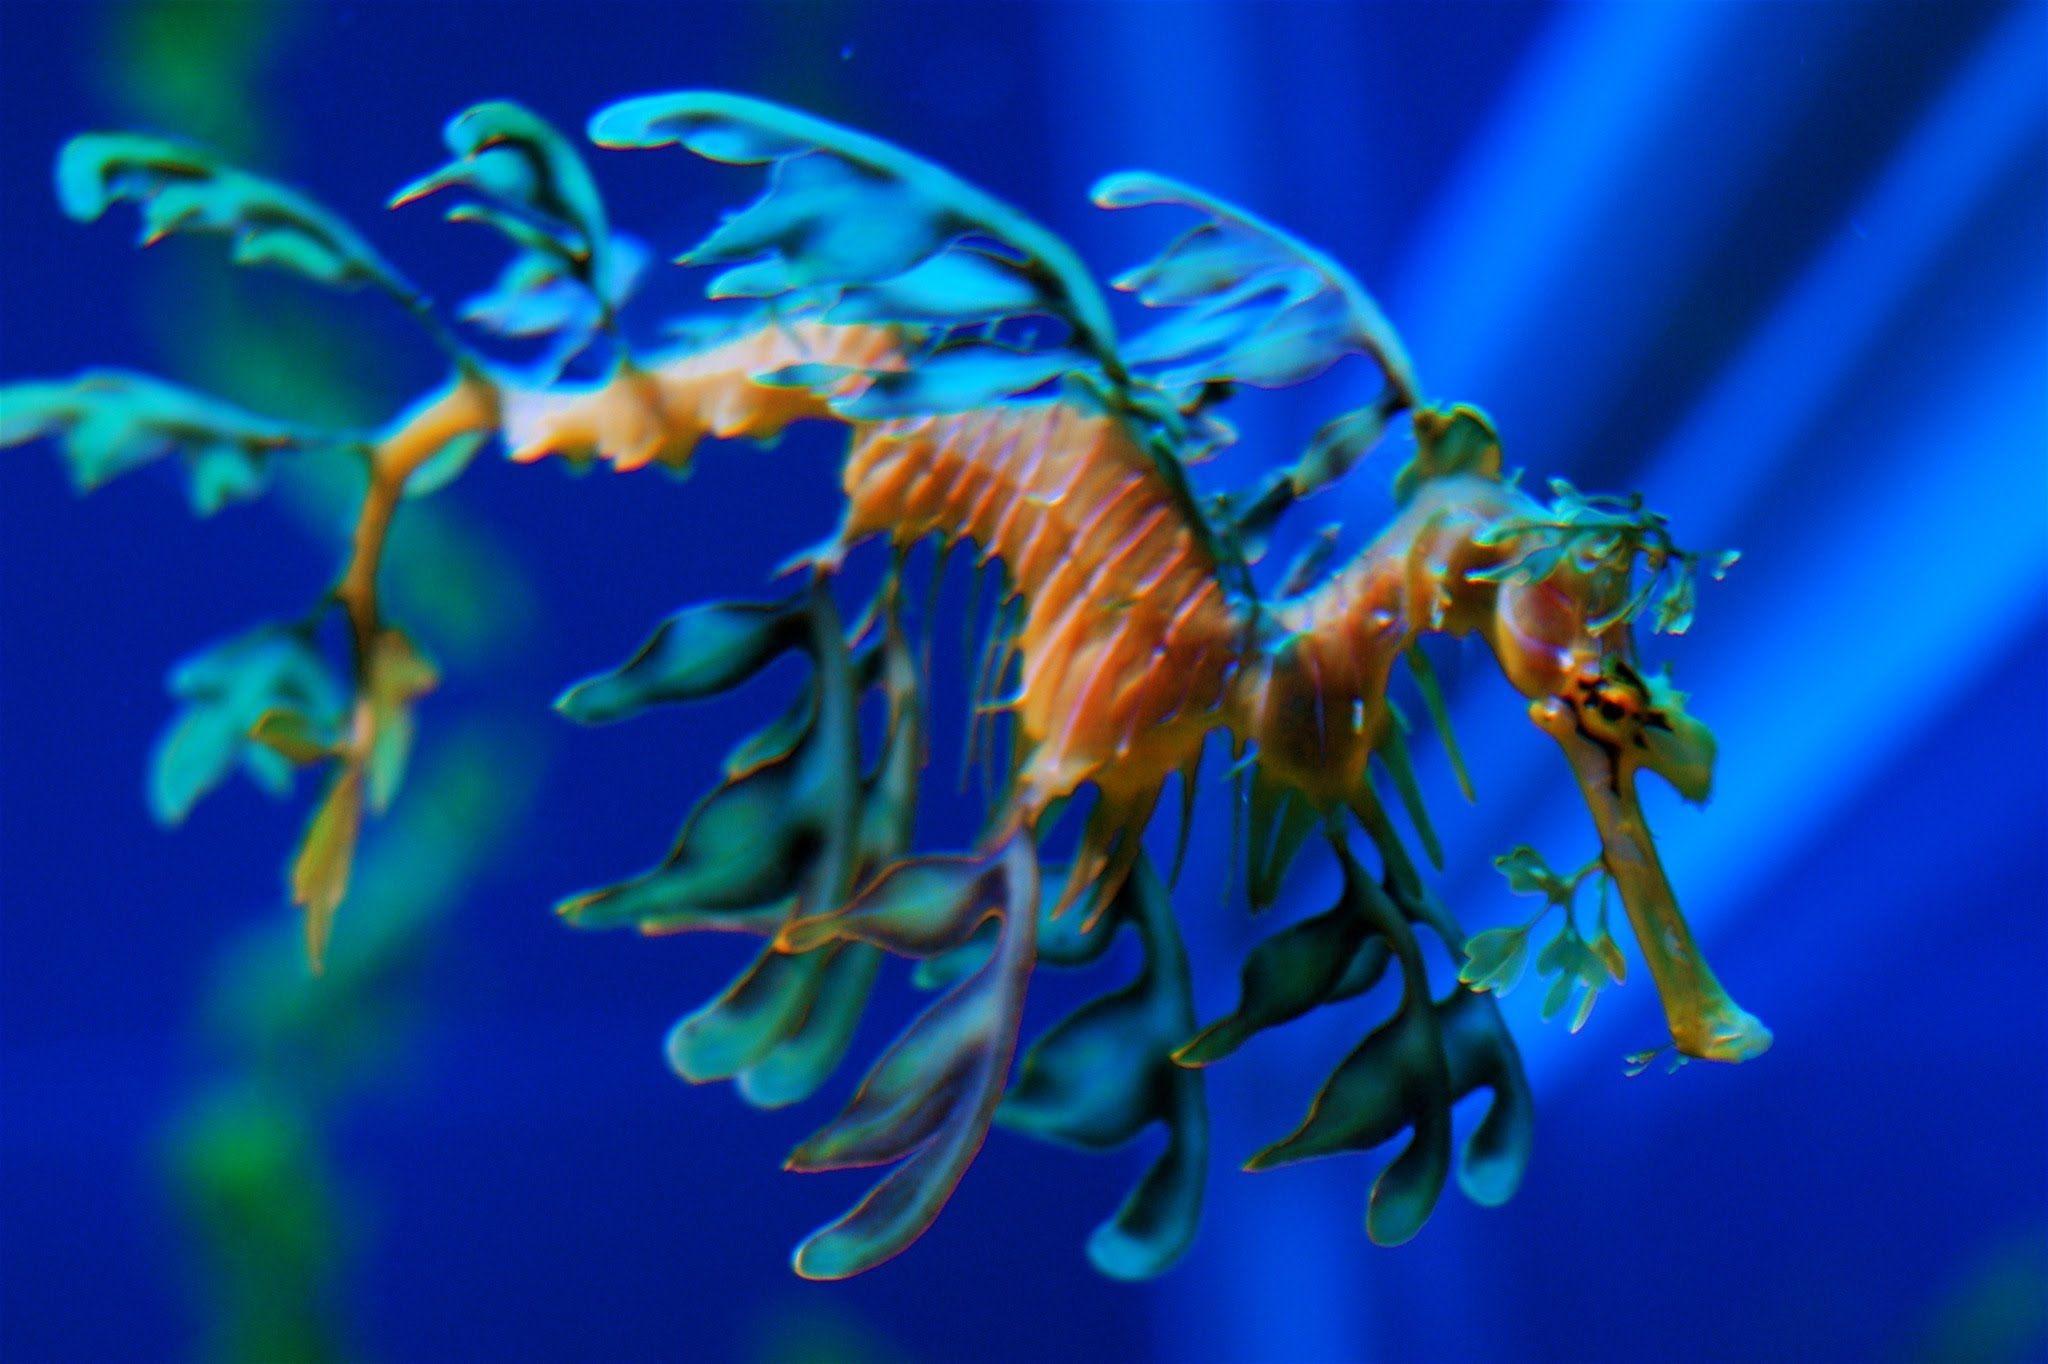 Leafy Sea Dragons Documentary On Australia S Most Complex Sea Horse Found Of The Coast Of Yorke Peninsula South Weedy Sea Dragon Sea Dragon Leafy Sea Dragon